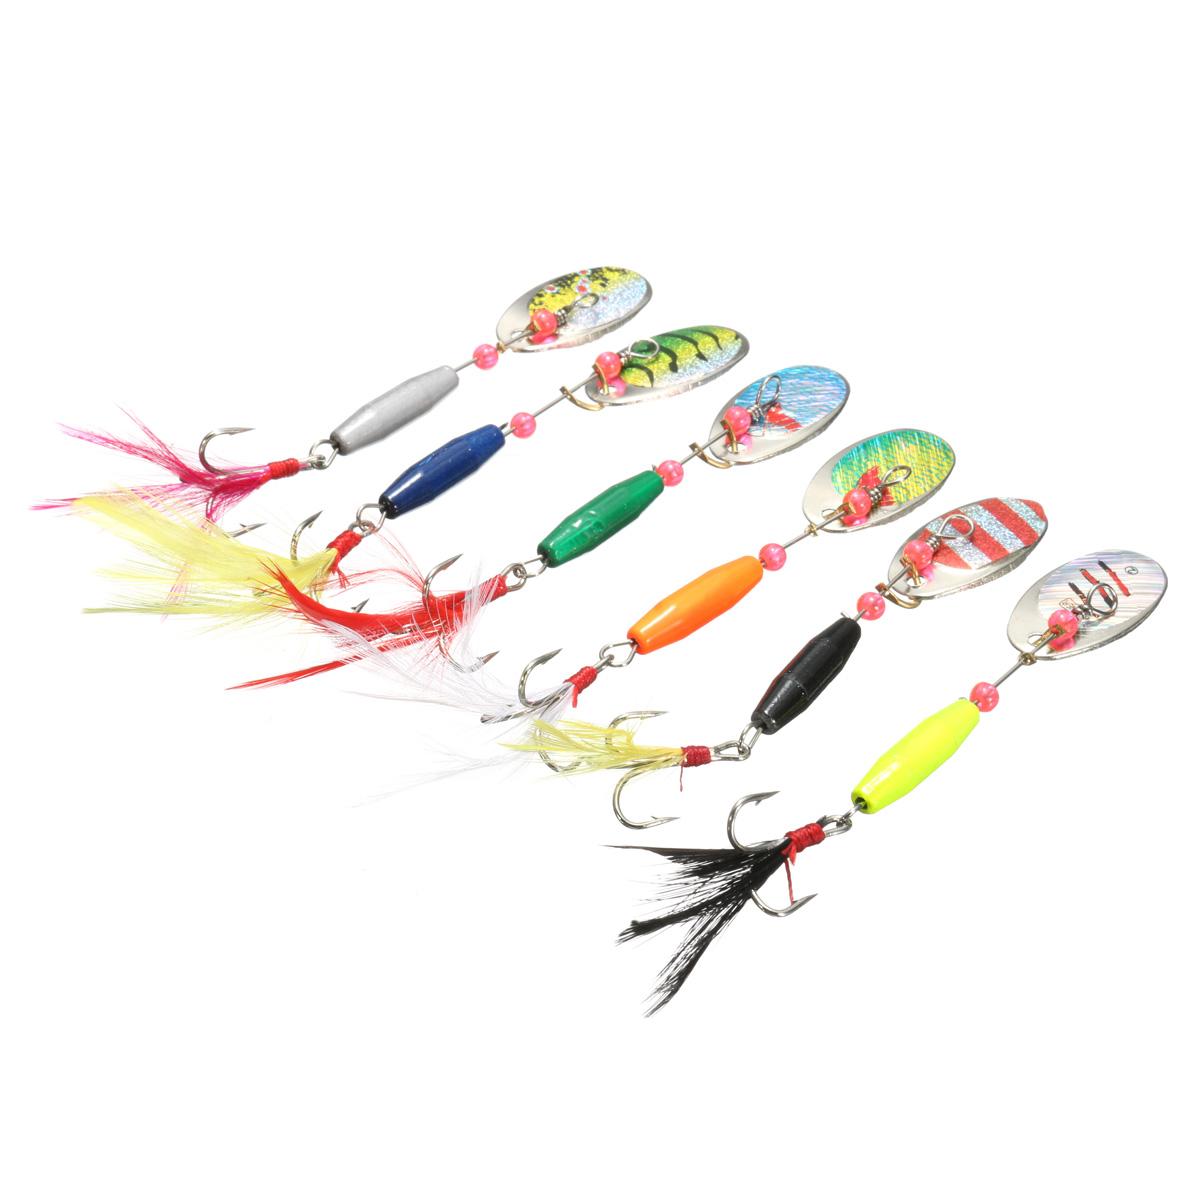 ZANLURE 6PCS 9CM Spoon Metal Fishing Lures Spinner Baits CrankBaits Hooks Baits Tackle Tools (Eachine1) Amarillo Продажа б у